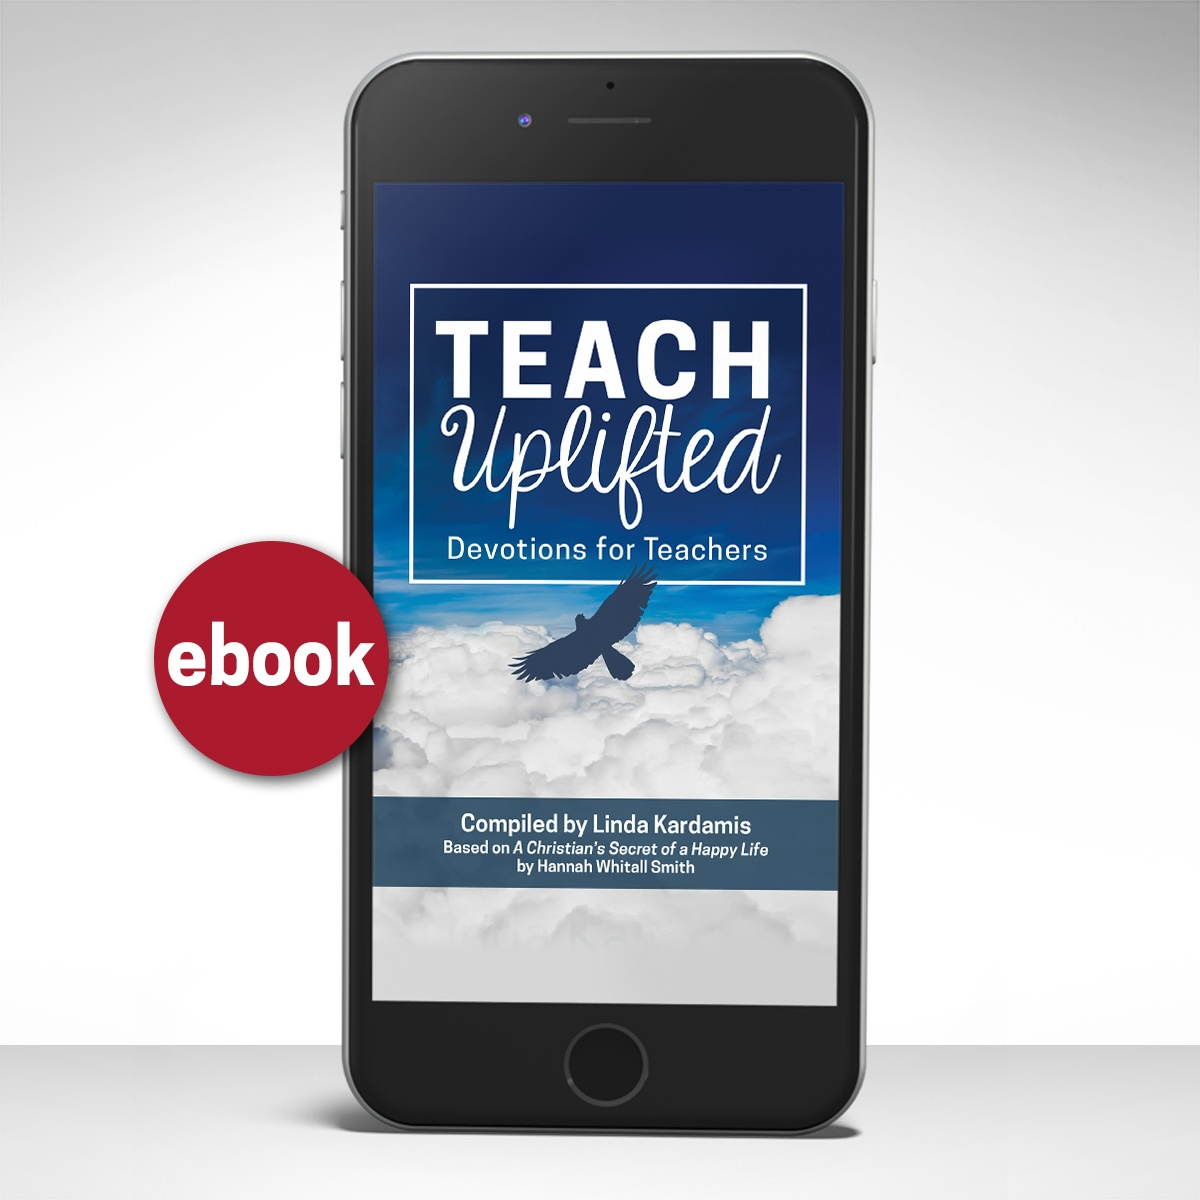 Teach Uplifted ebook - devotions for teachers